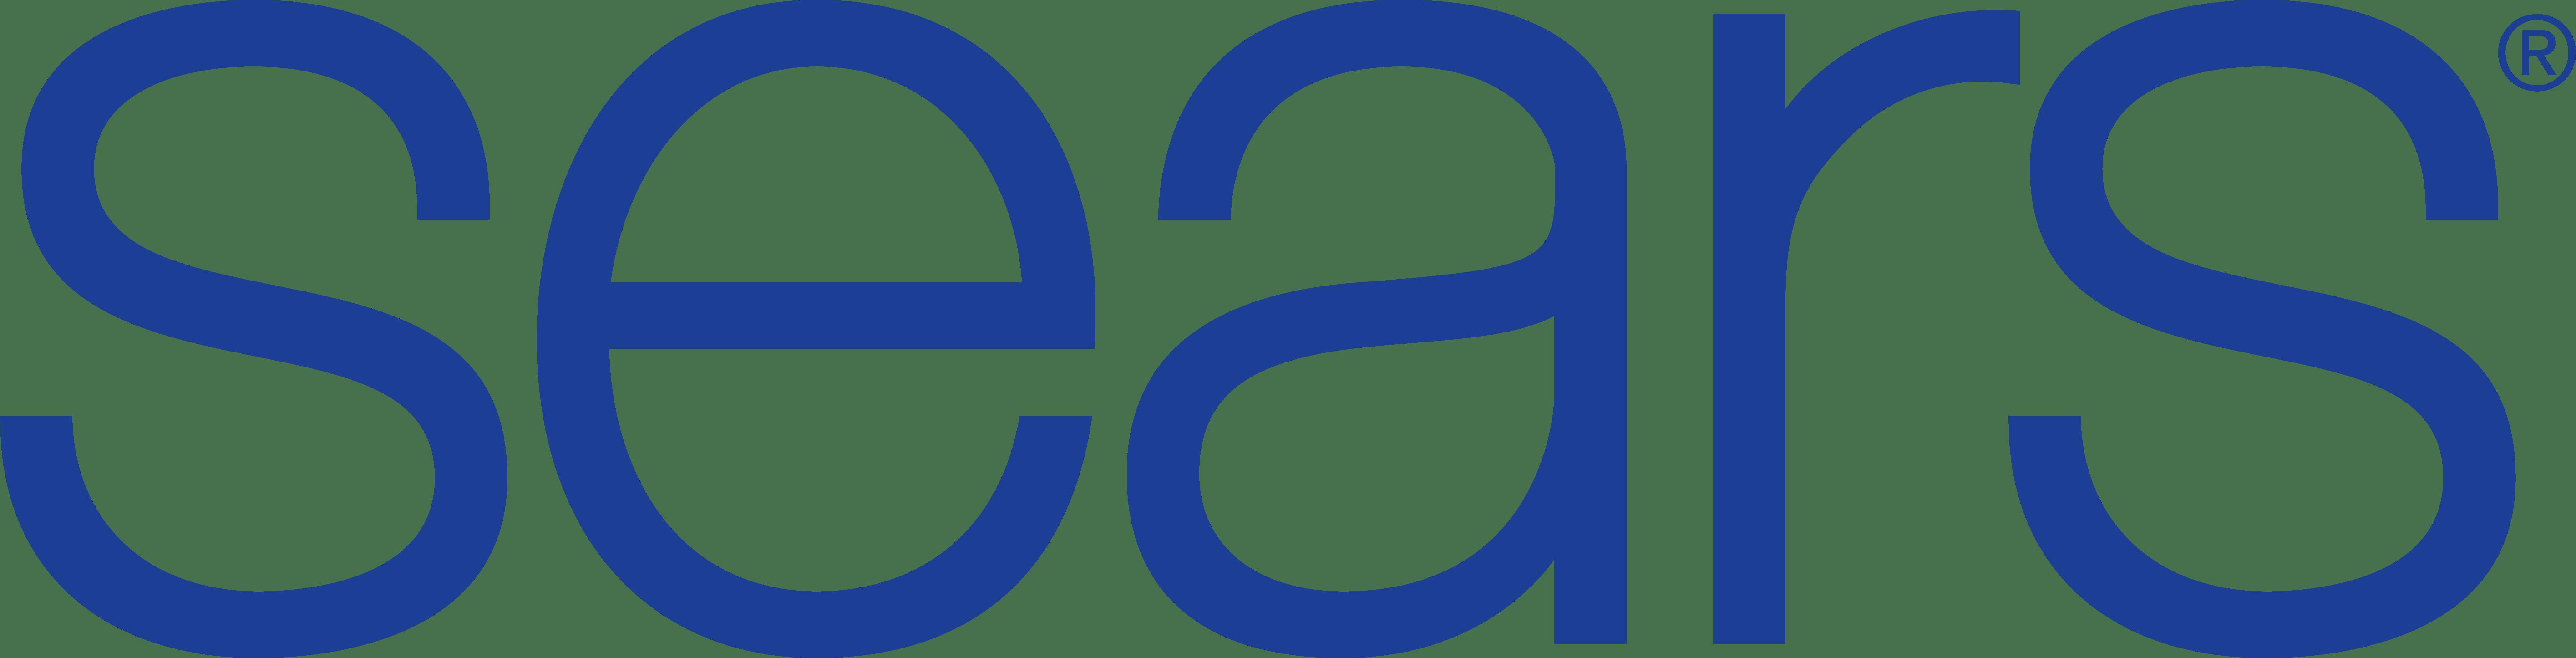 Sears Logo transparent PNG.